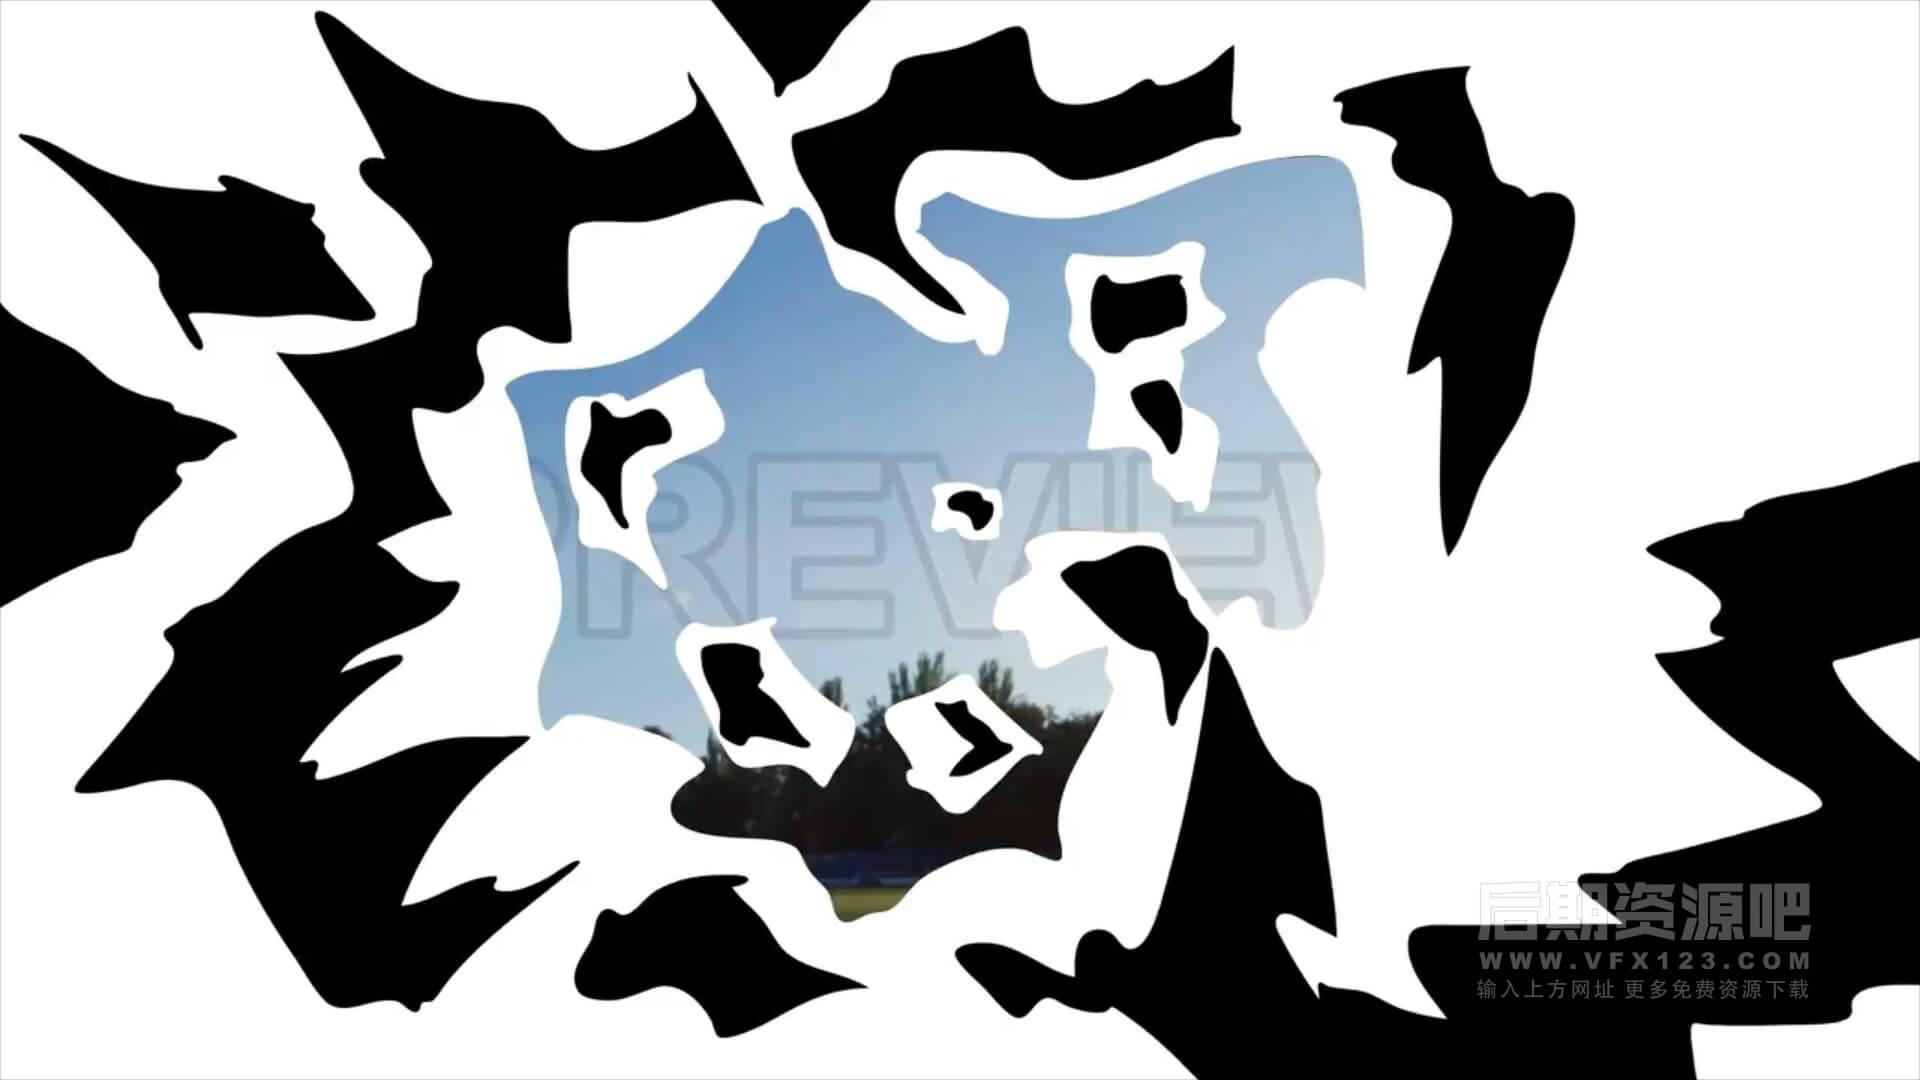 Fcpx转场插件 10组手绘卡通爆炸火焰效果过渡转场预设 Explosion Transition